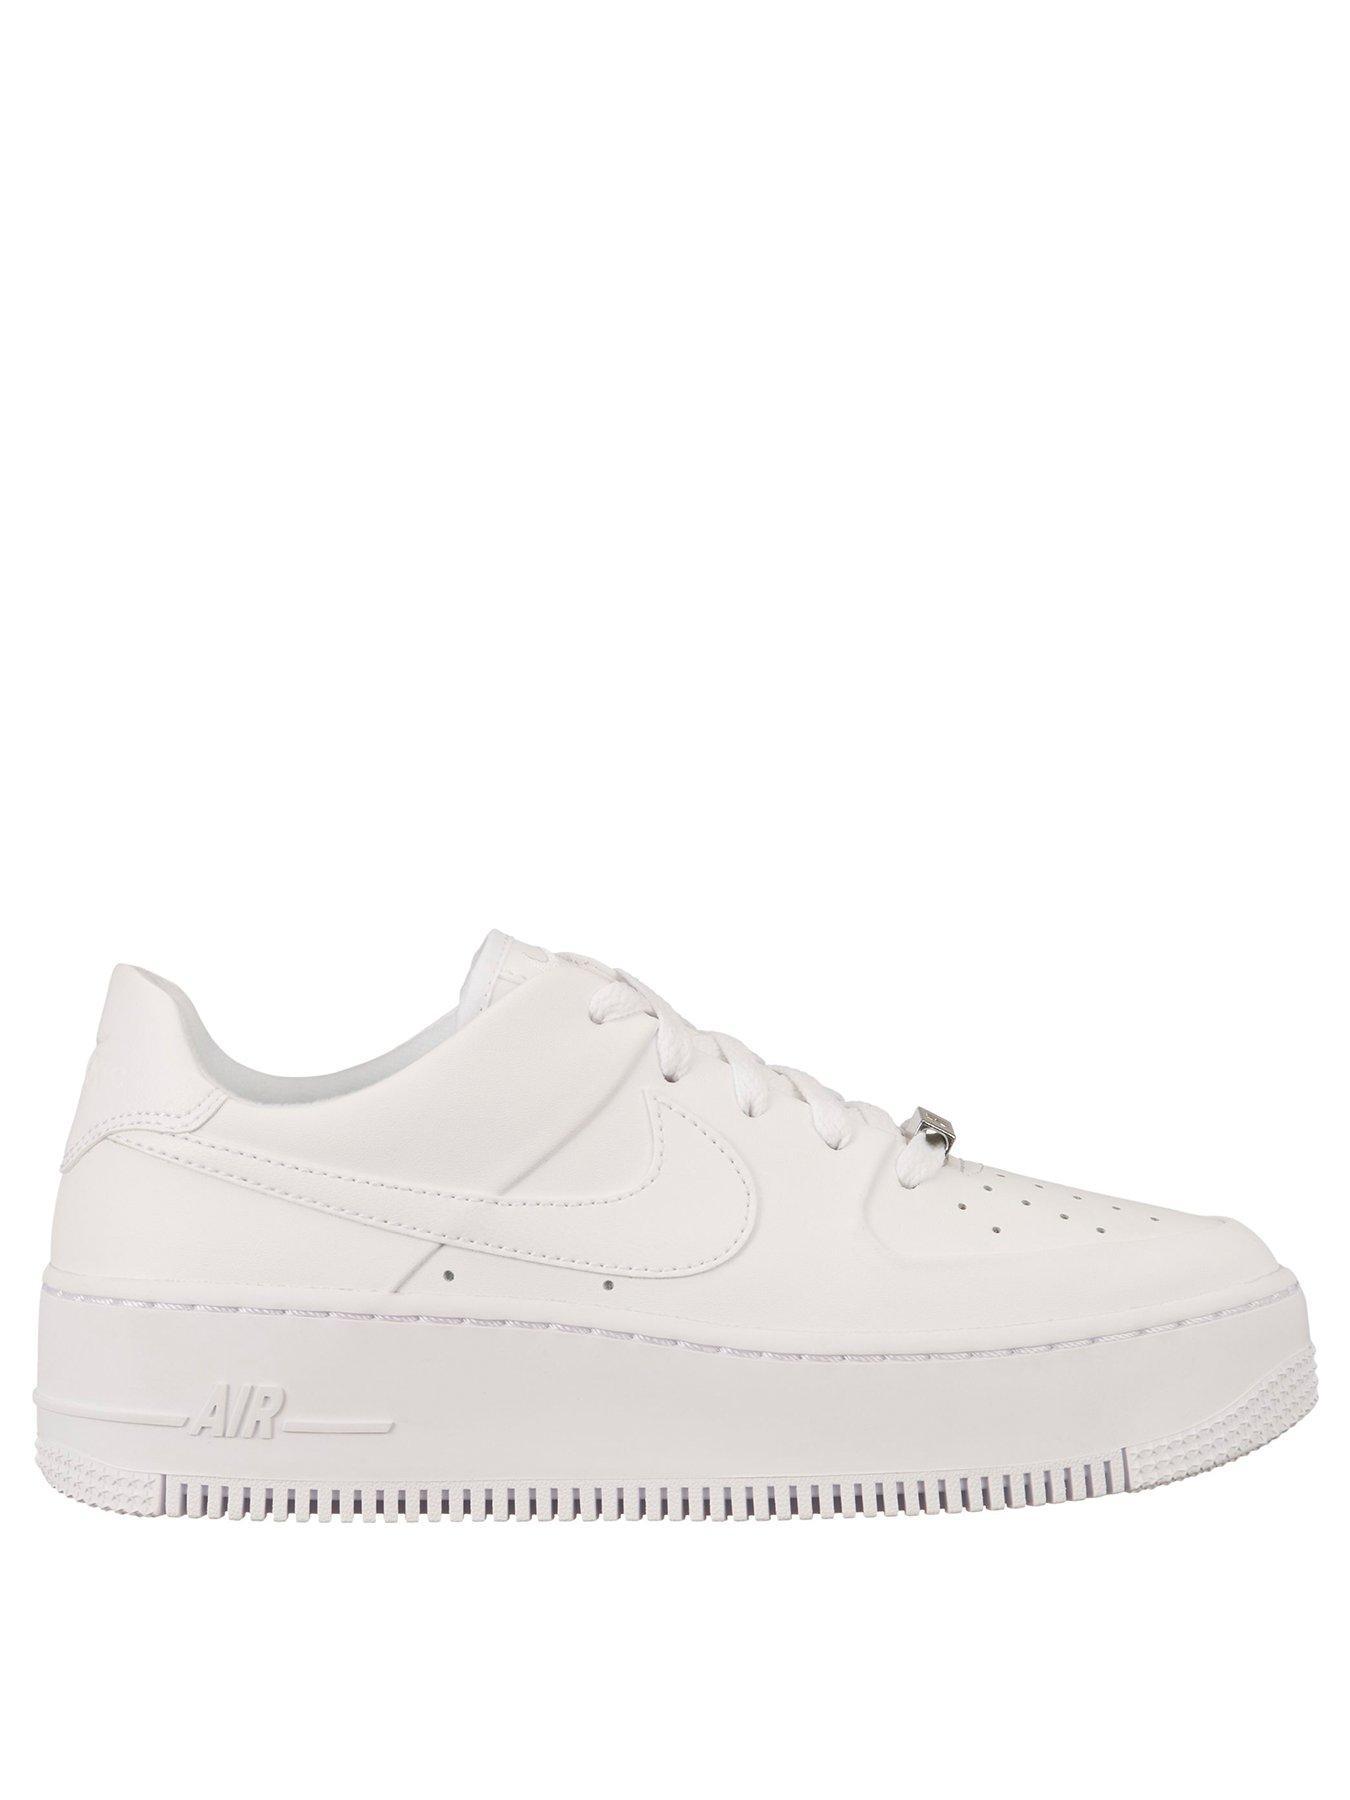 Nike Air Force 1 | Trainers | Women